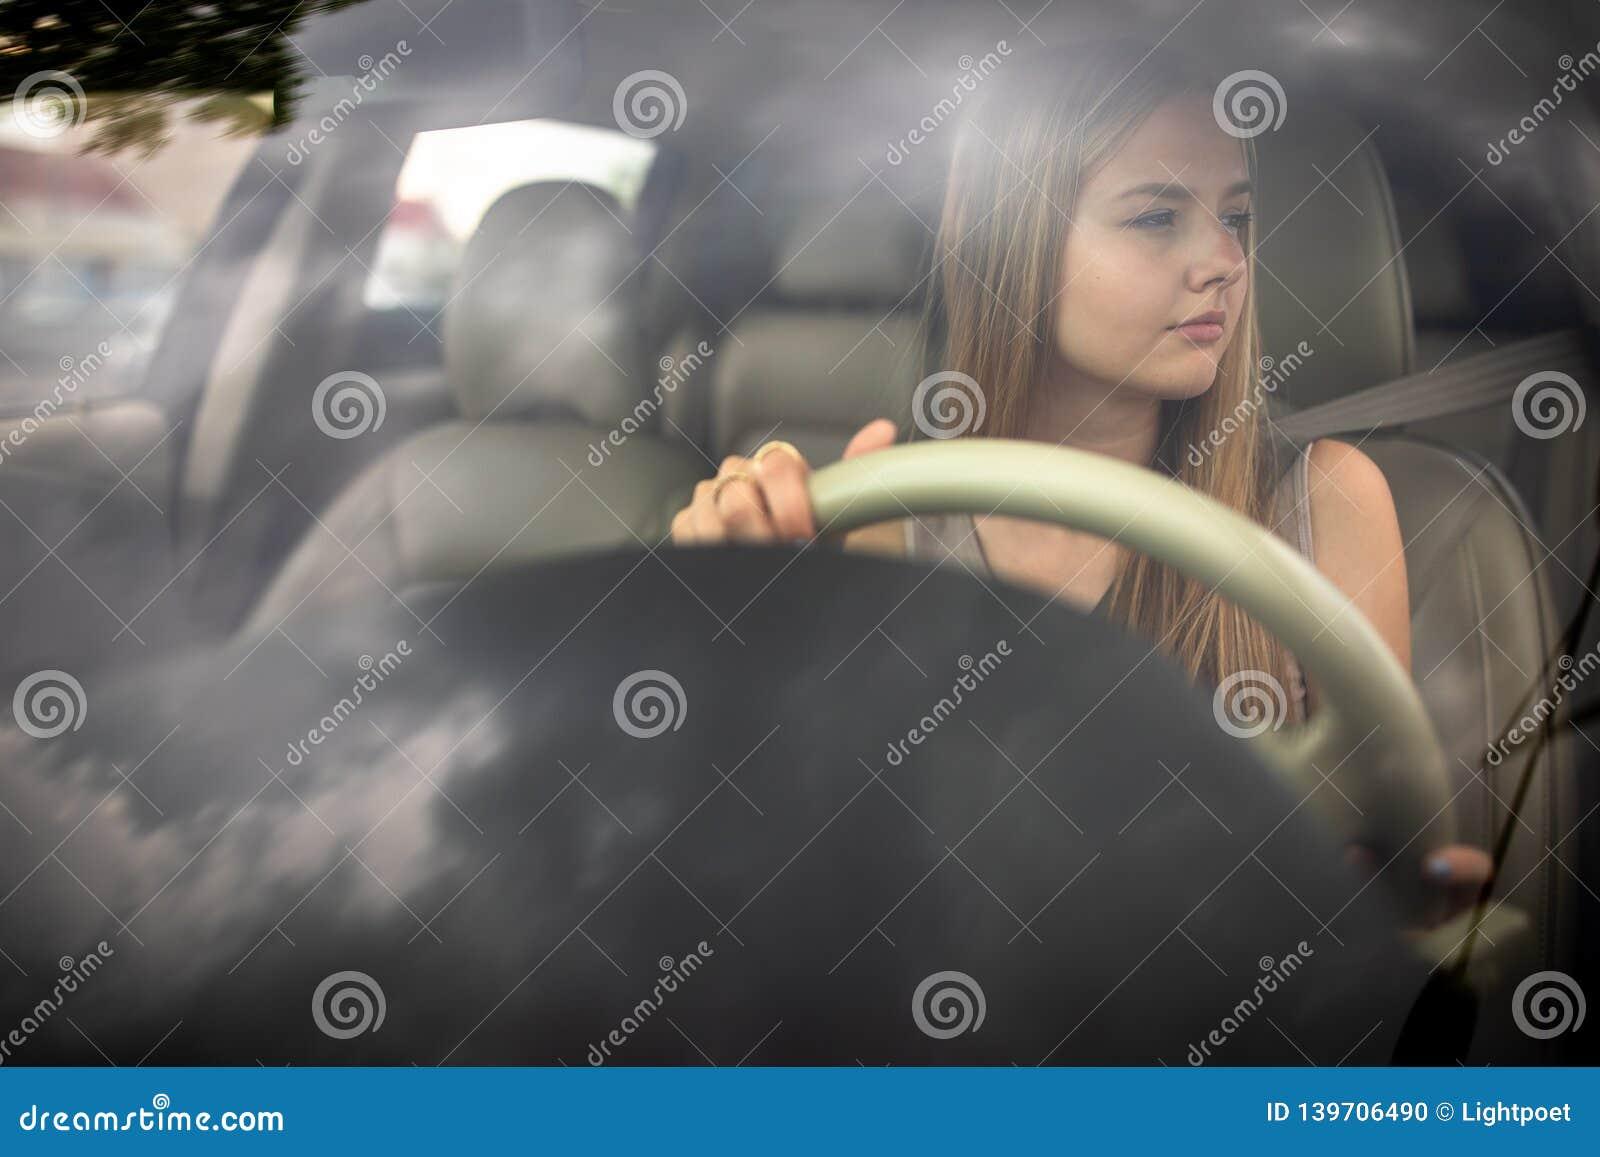 Cute female teen driver enjoying her freshly acquired driving license